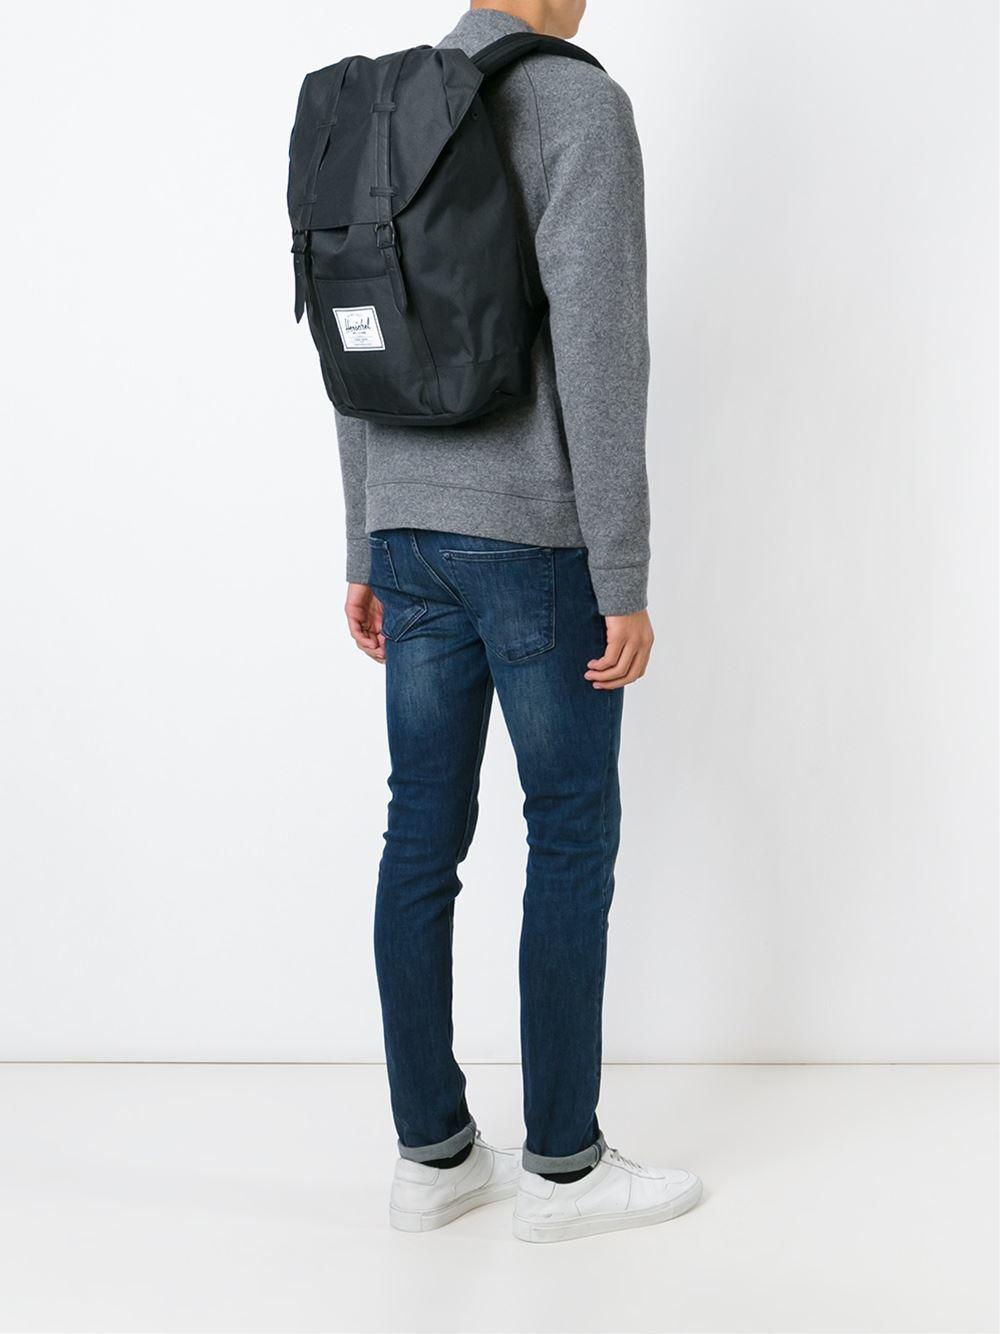 Herschel Supply Co. Retreat Backpack in Black for Men - Lyst 38c352b6a5372